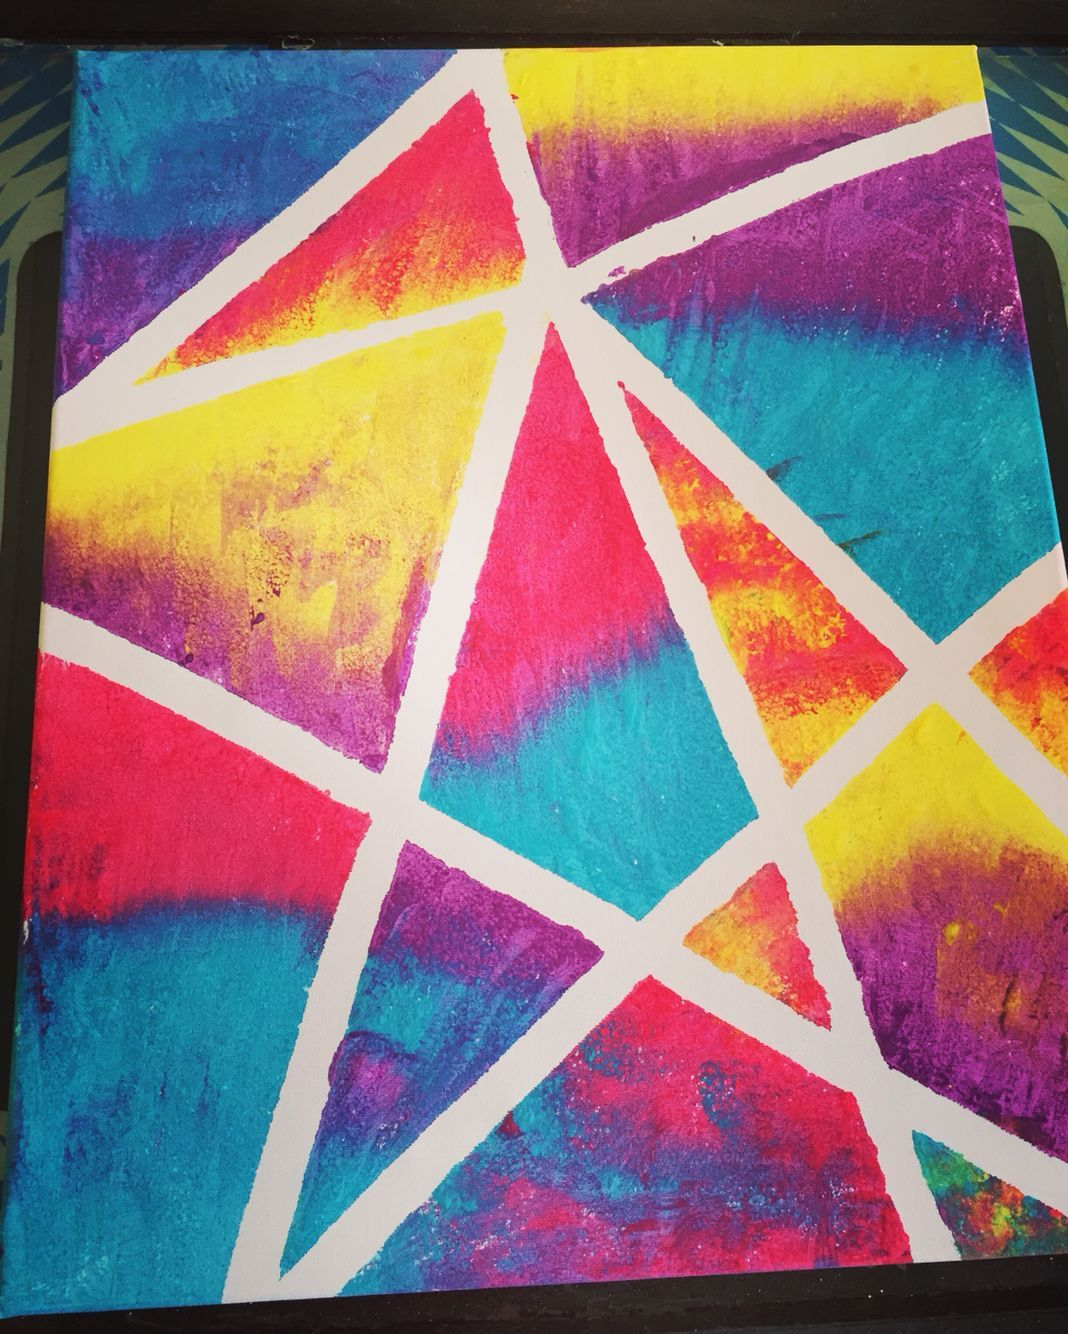 Canvas Painting Using Masking Tape Diy Canvas Art Painters Tape Art Tape Art